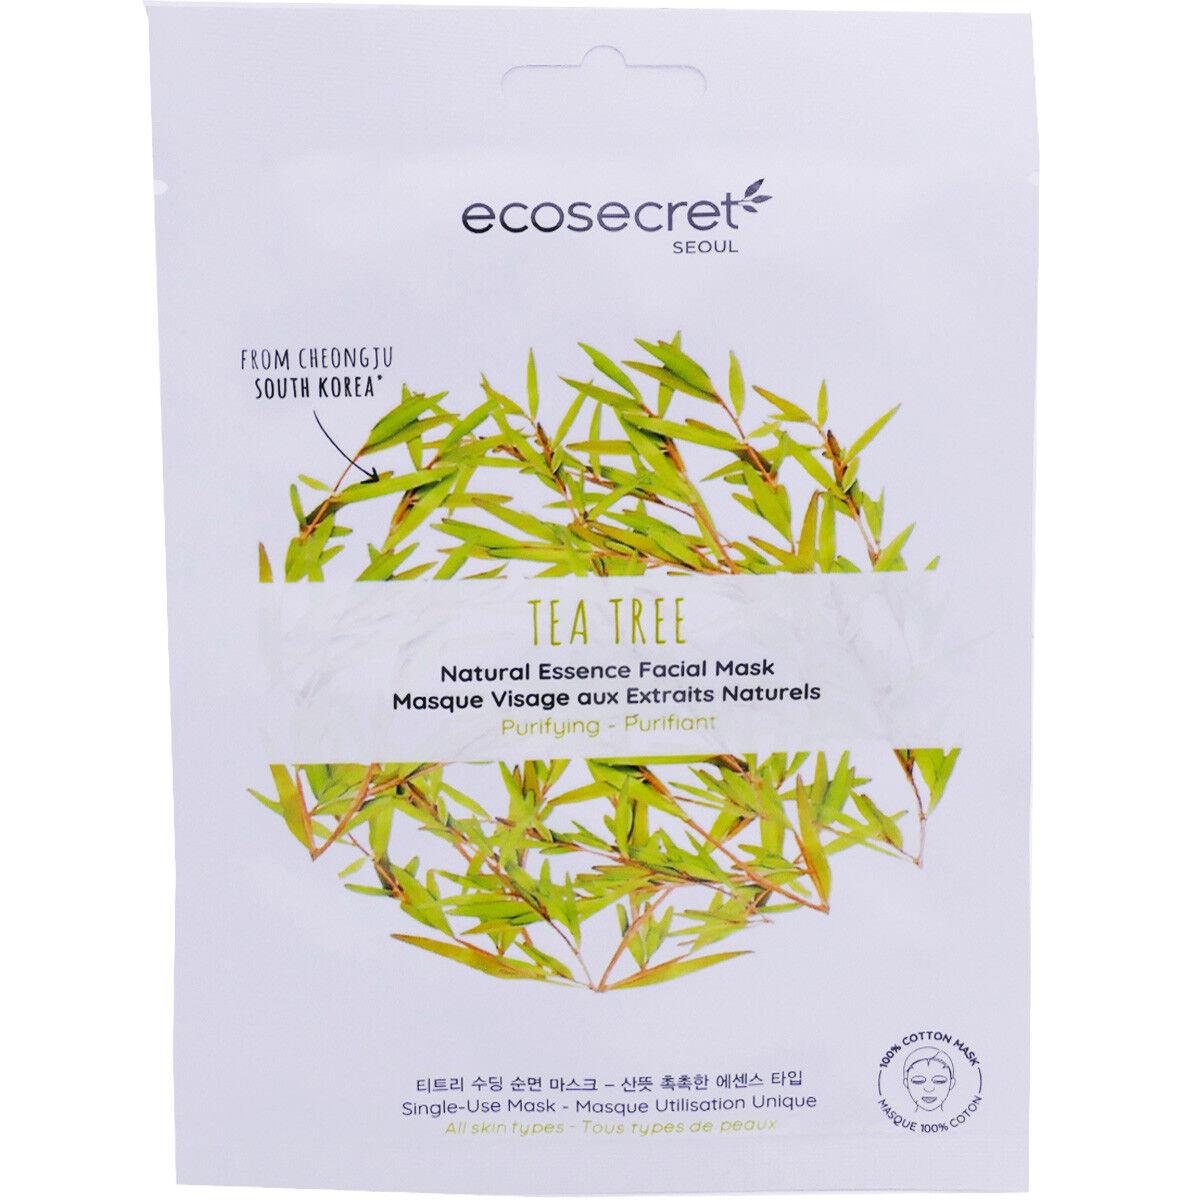 ECO SECRET Ecosecret tea tree masque cotton 20ml